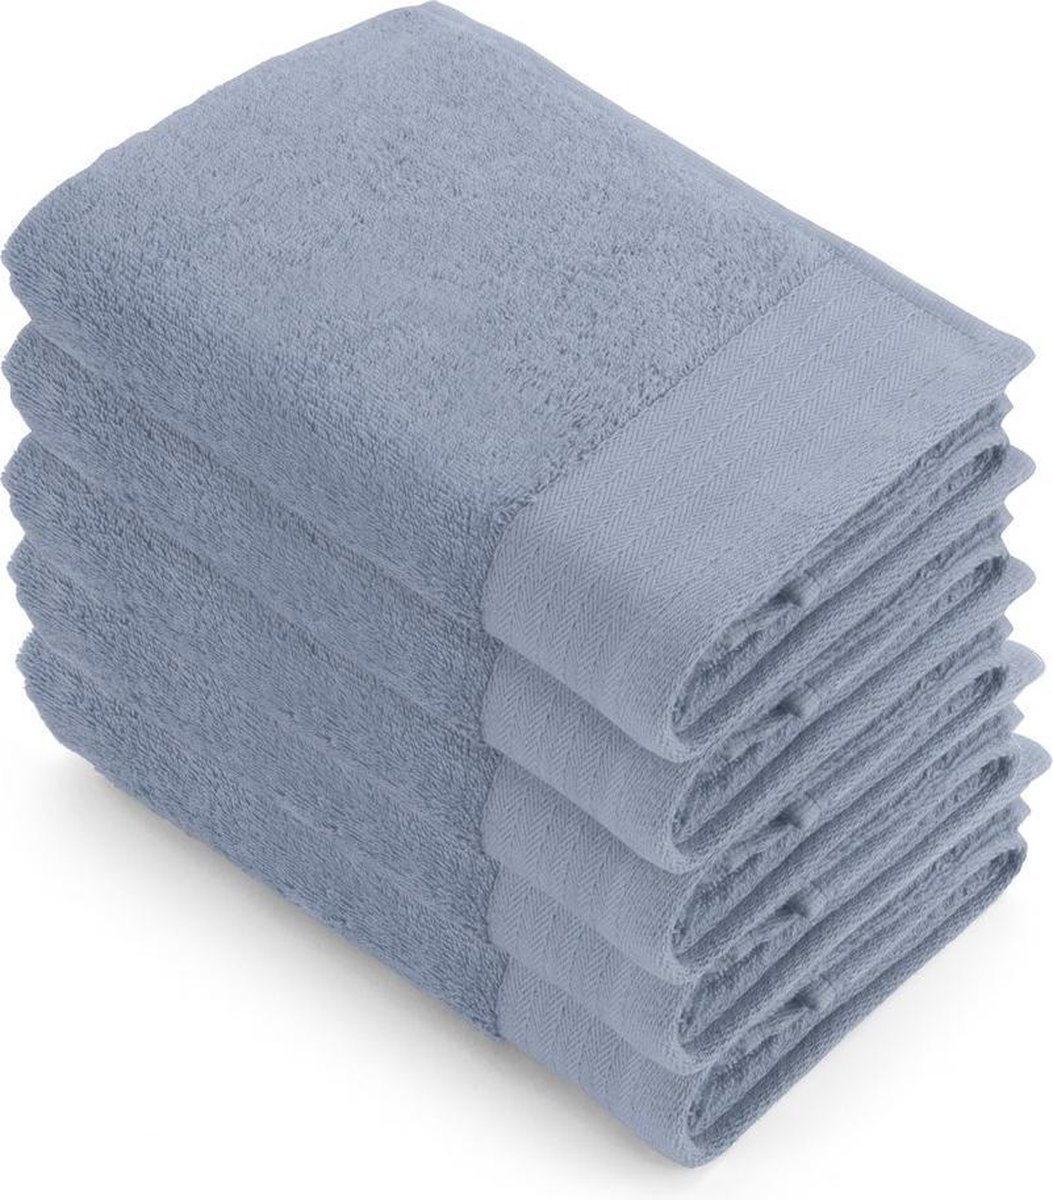 Walra Badgoedset - 5-delig - 5x 50x100 - 100% katoen - Blauw - Walra